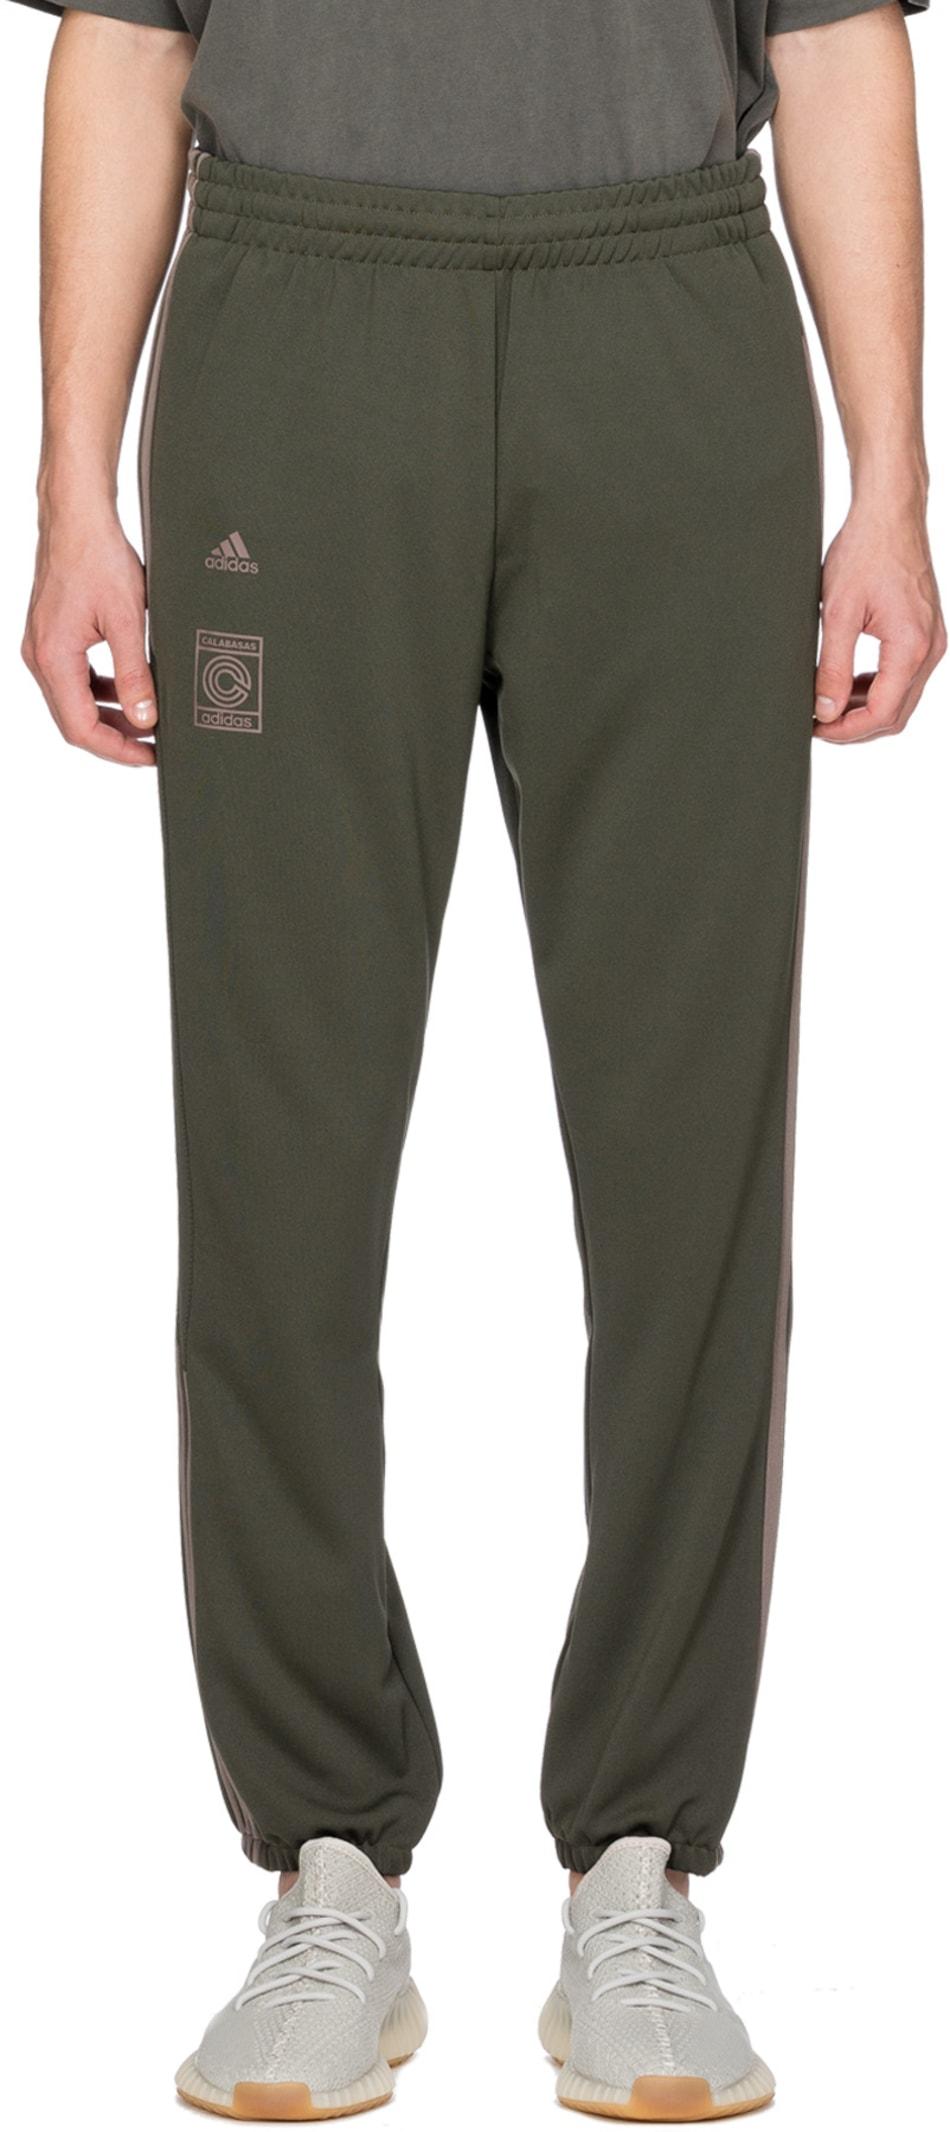 6e7098431 YEEZY  Calabasas Track Pants - Core Mink